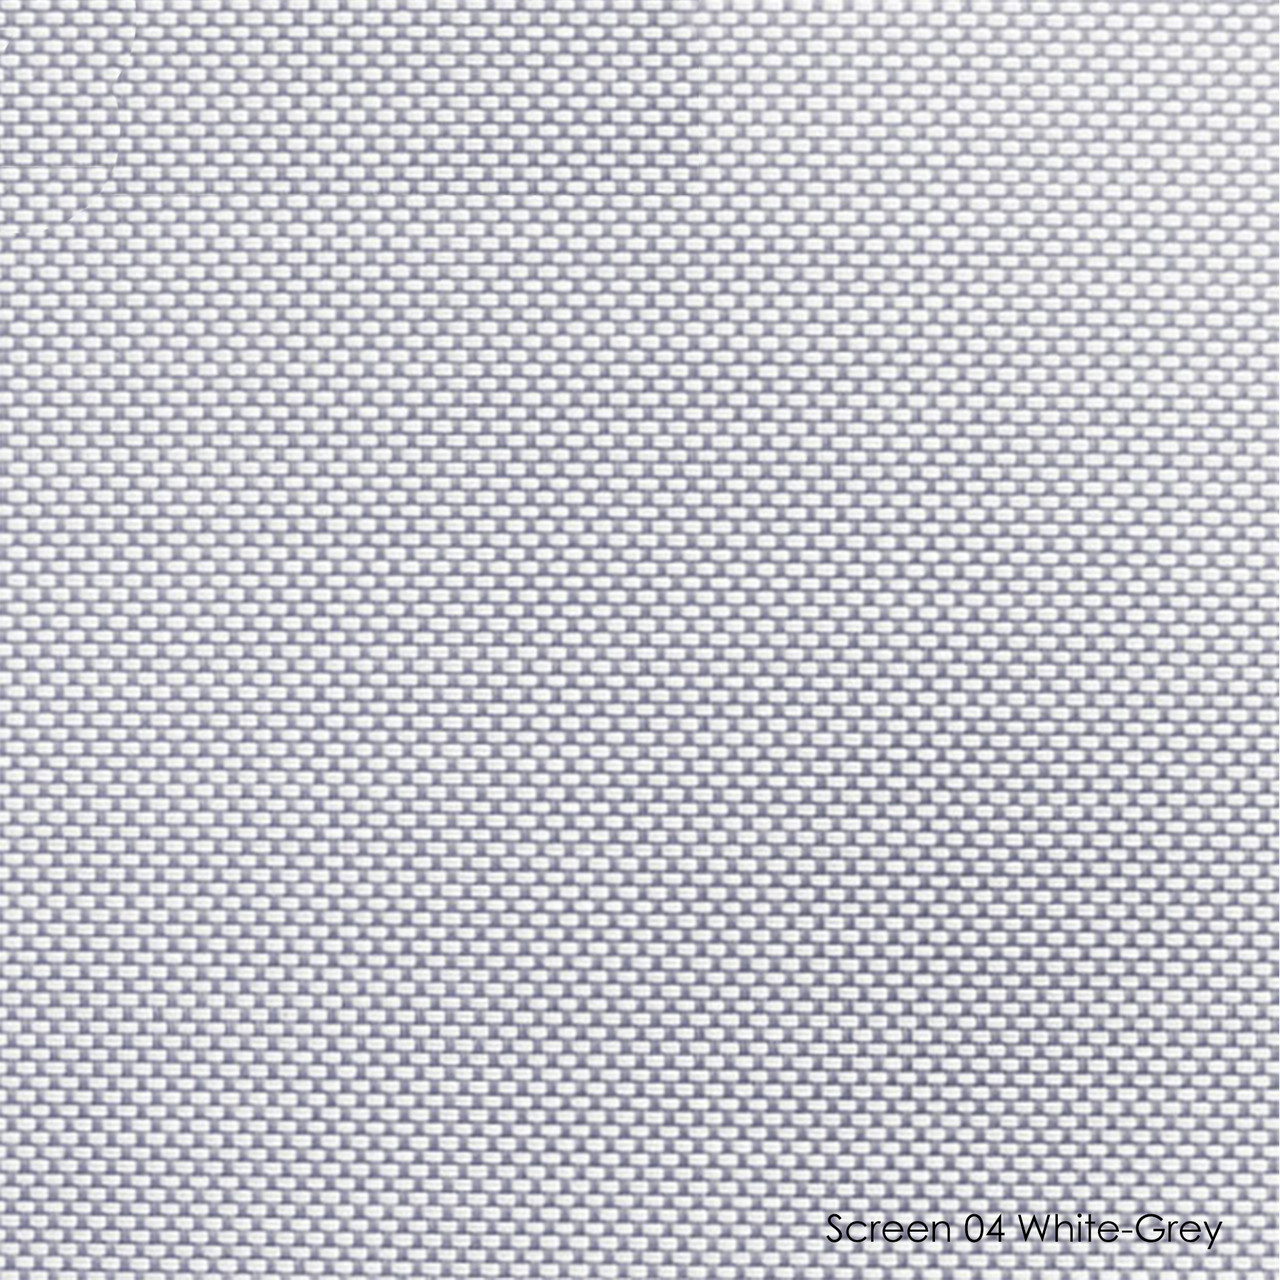 Screen-04 white-grey